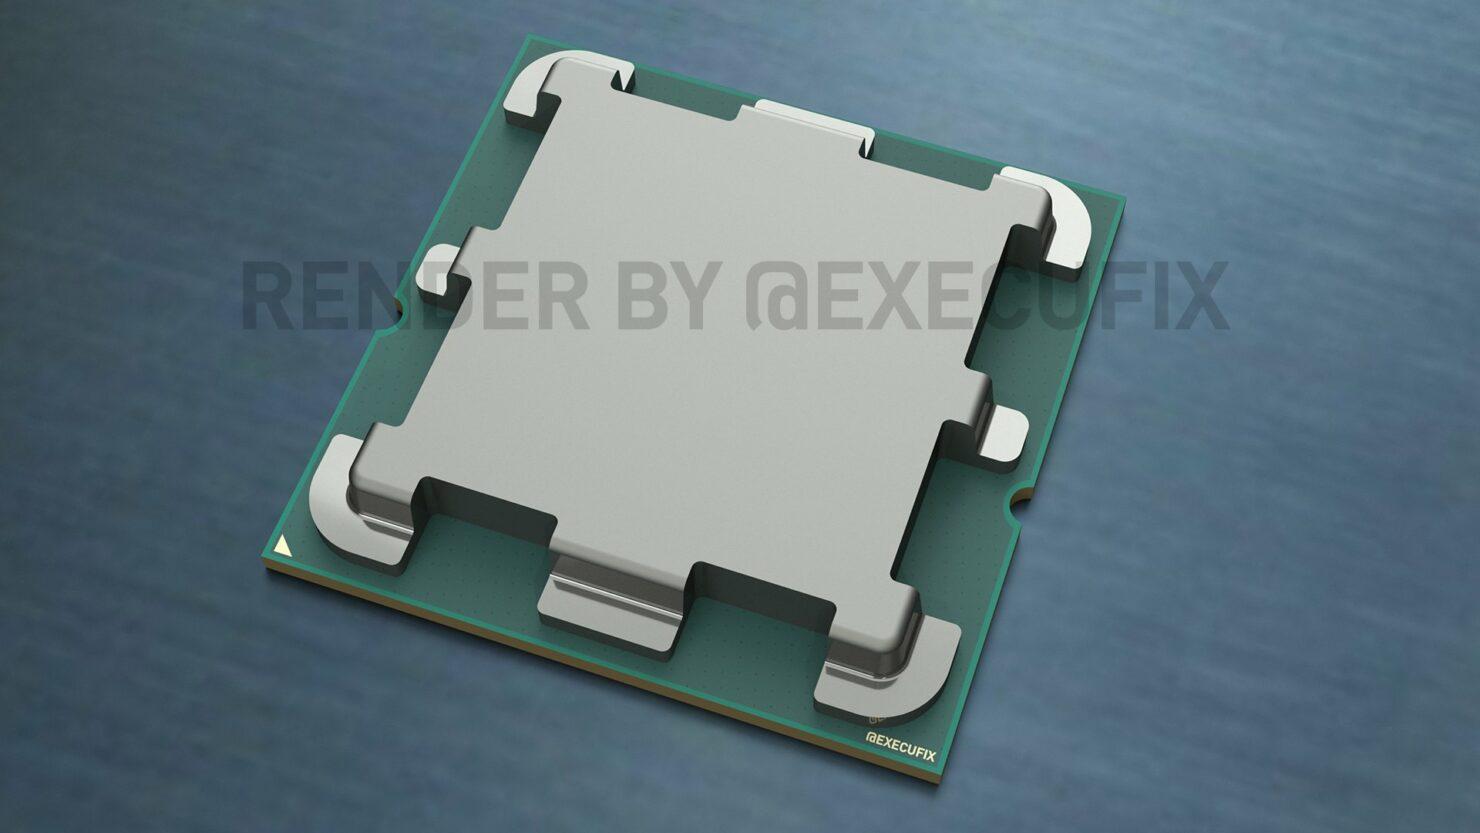 amd-ryzen-raphael-zen-4-desktop-cpus-for-am5-lga-1718-socket-platform-package-pictured-_2